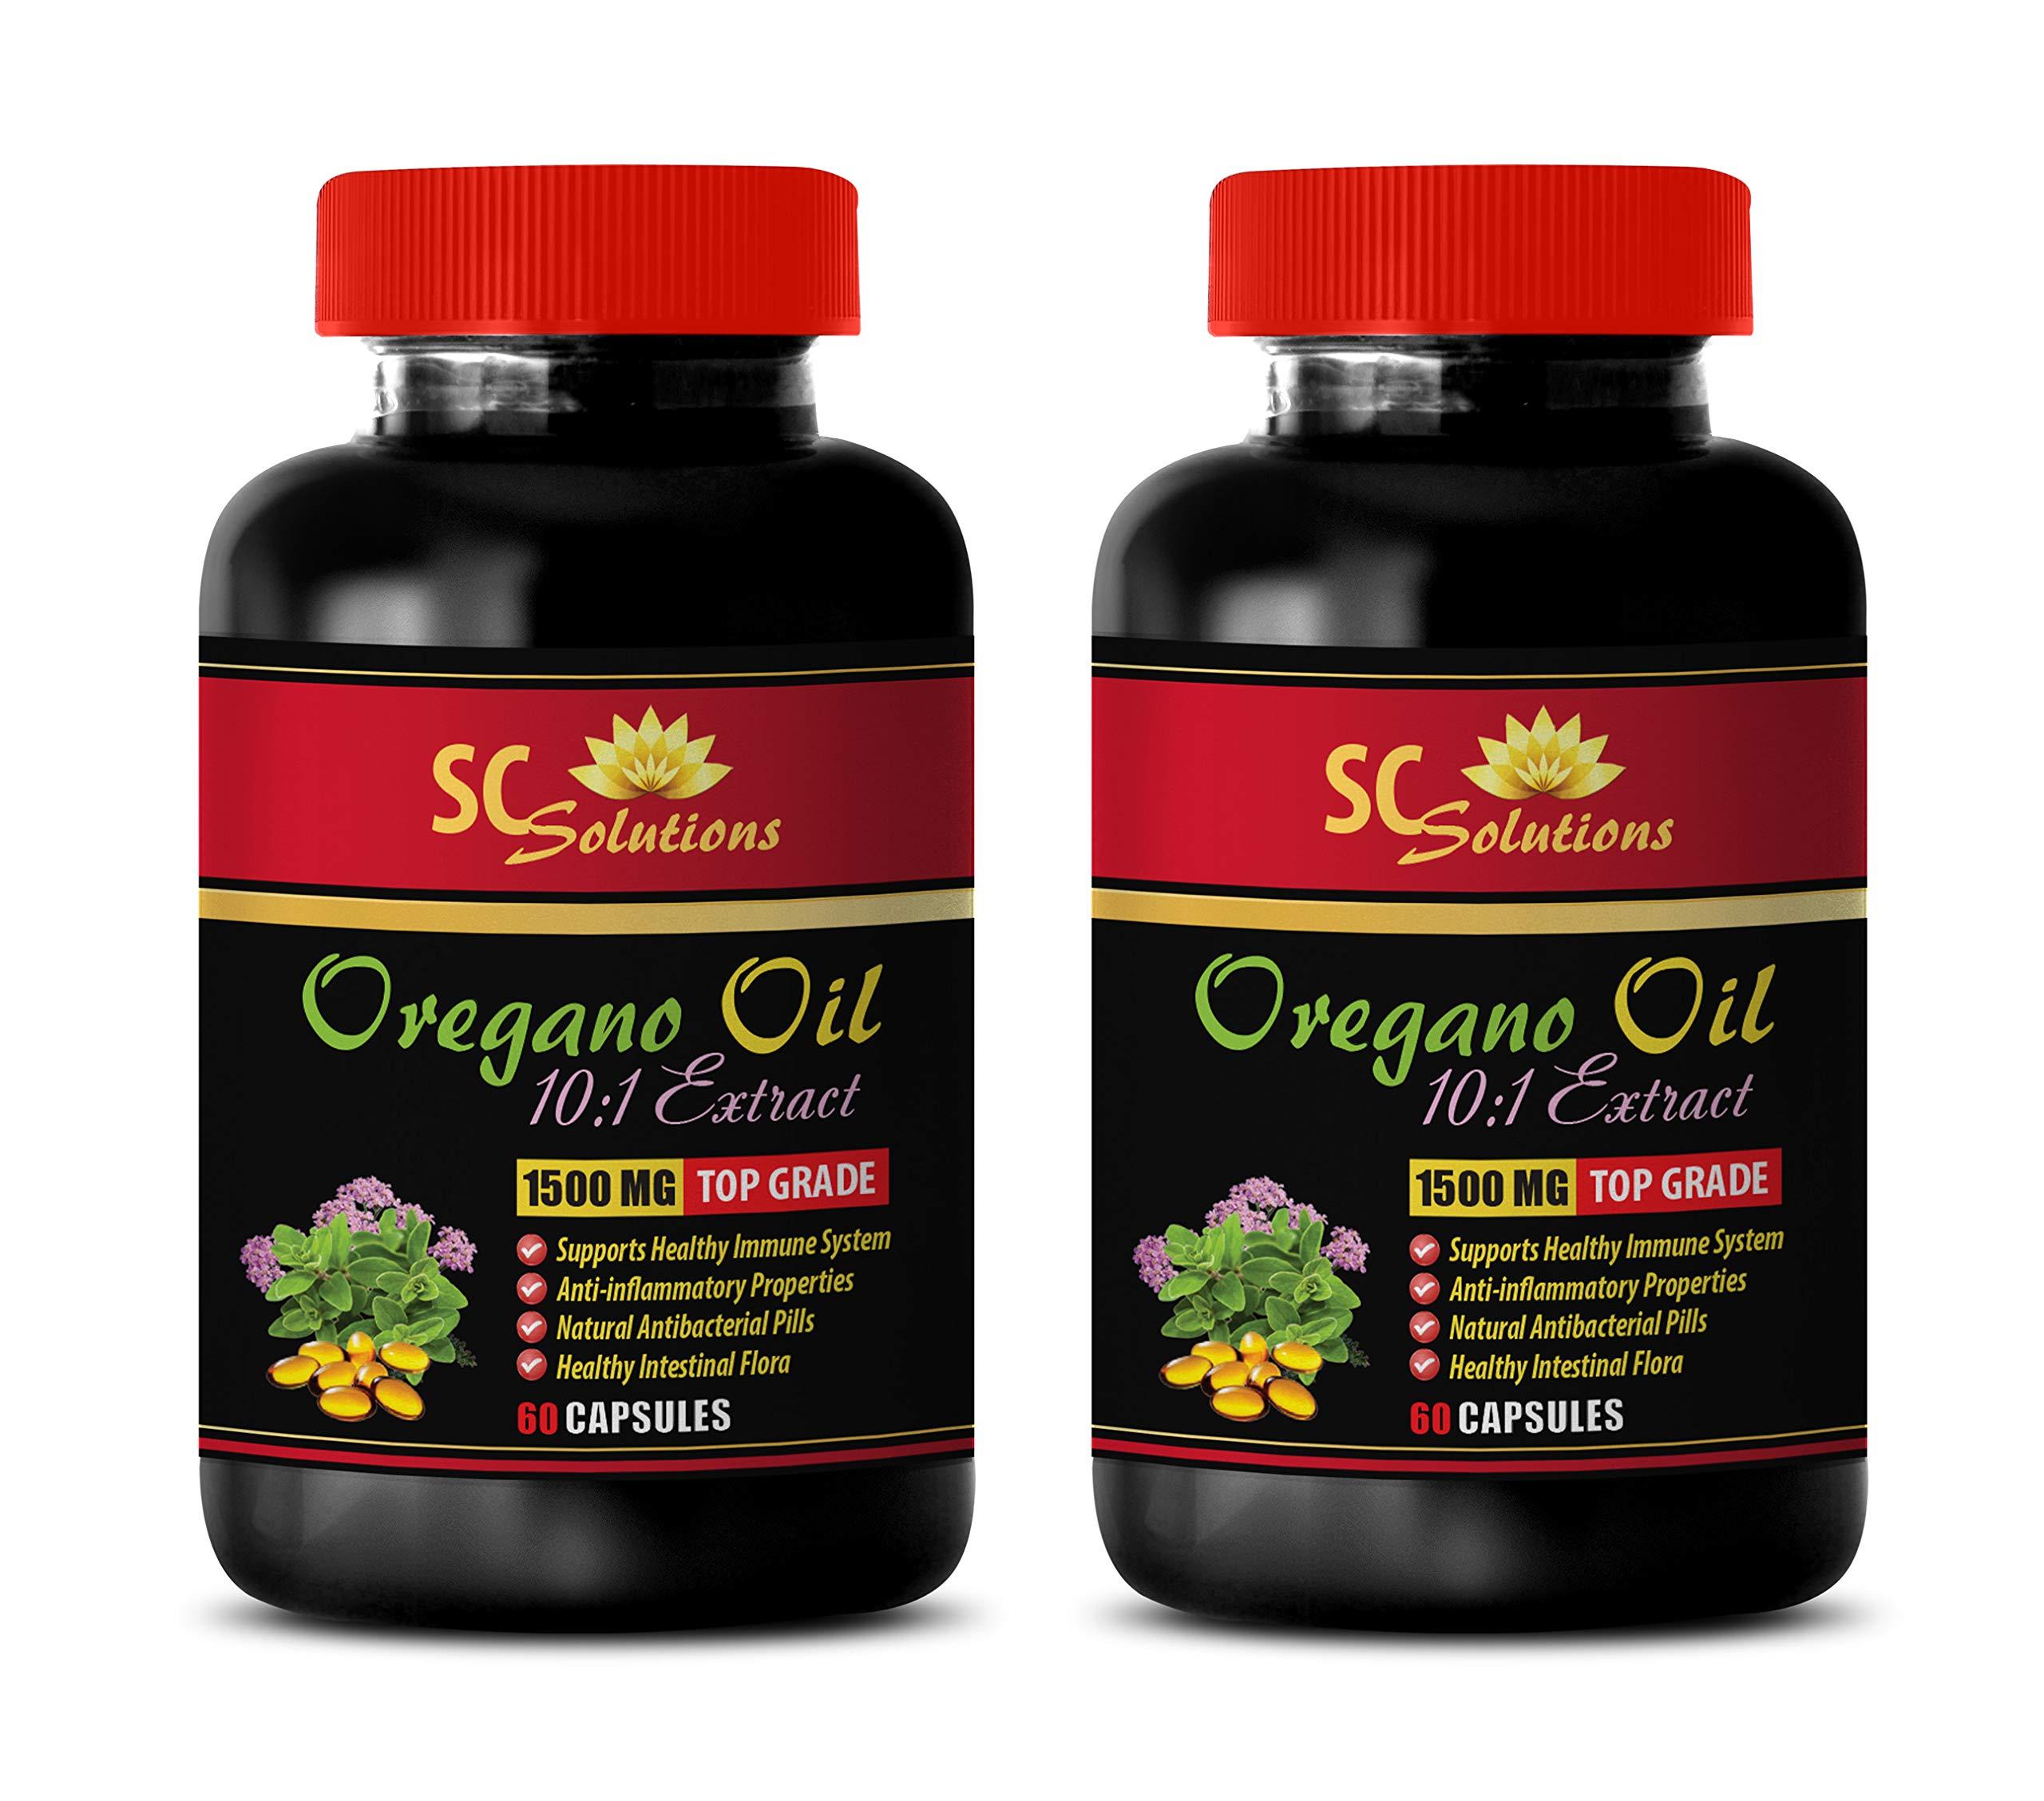 Digestive cleaner - OREGANO OIL EXTRACT 1500mg - Oregano capsules - 2 Bottles 120 Capsules